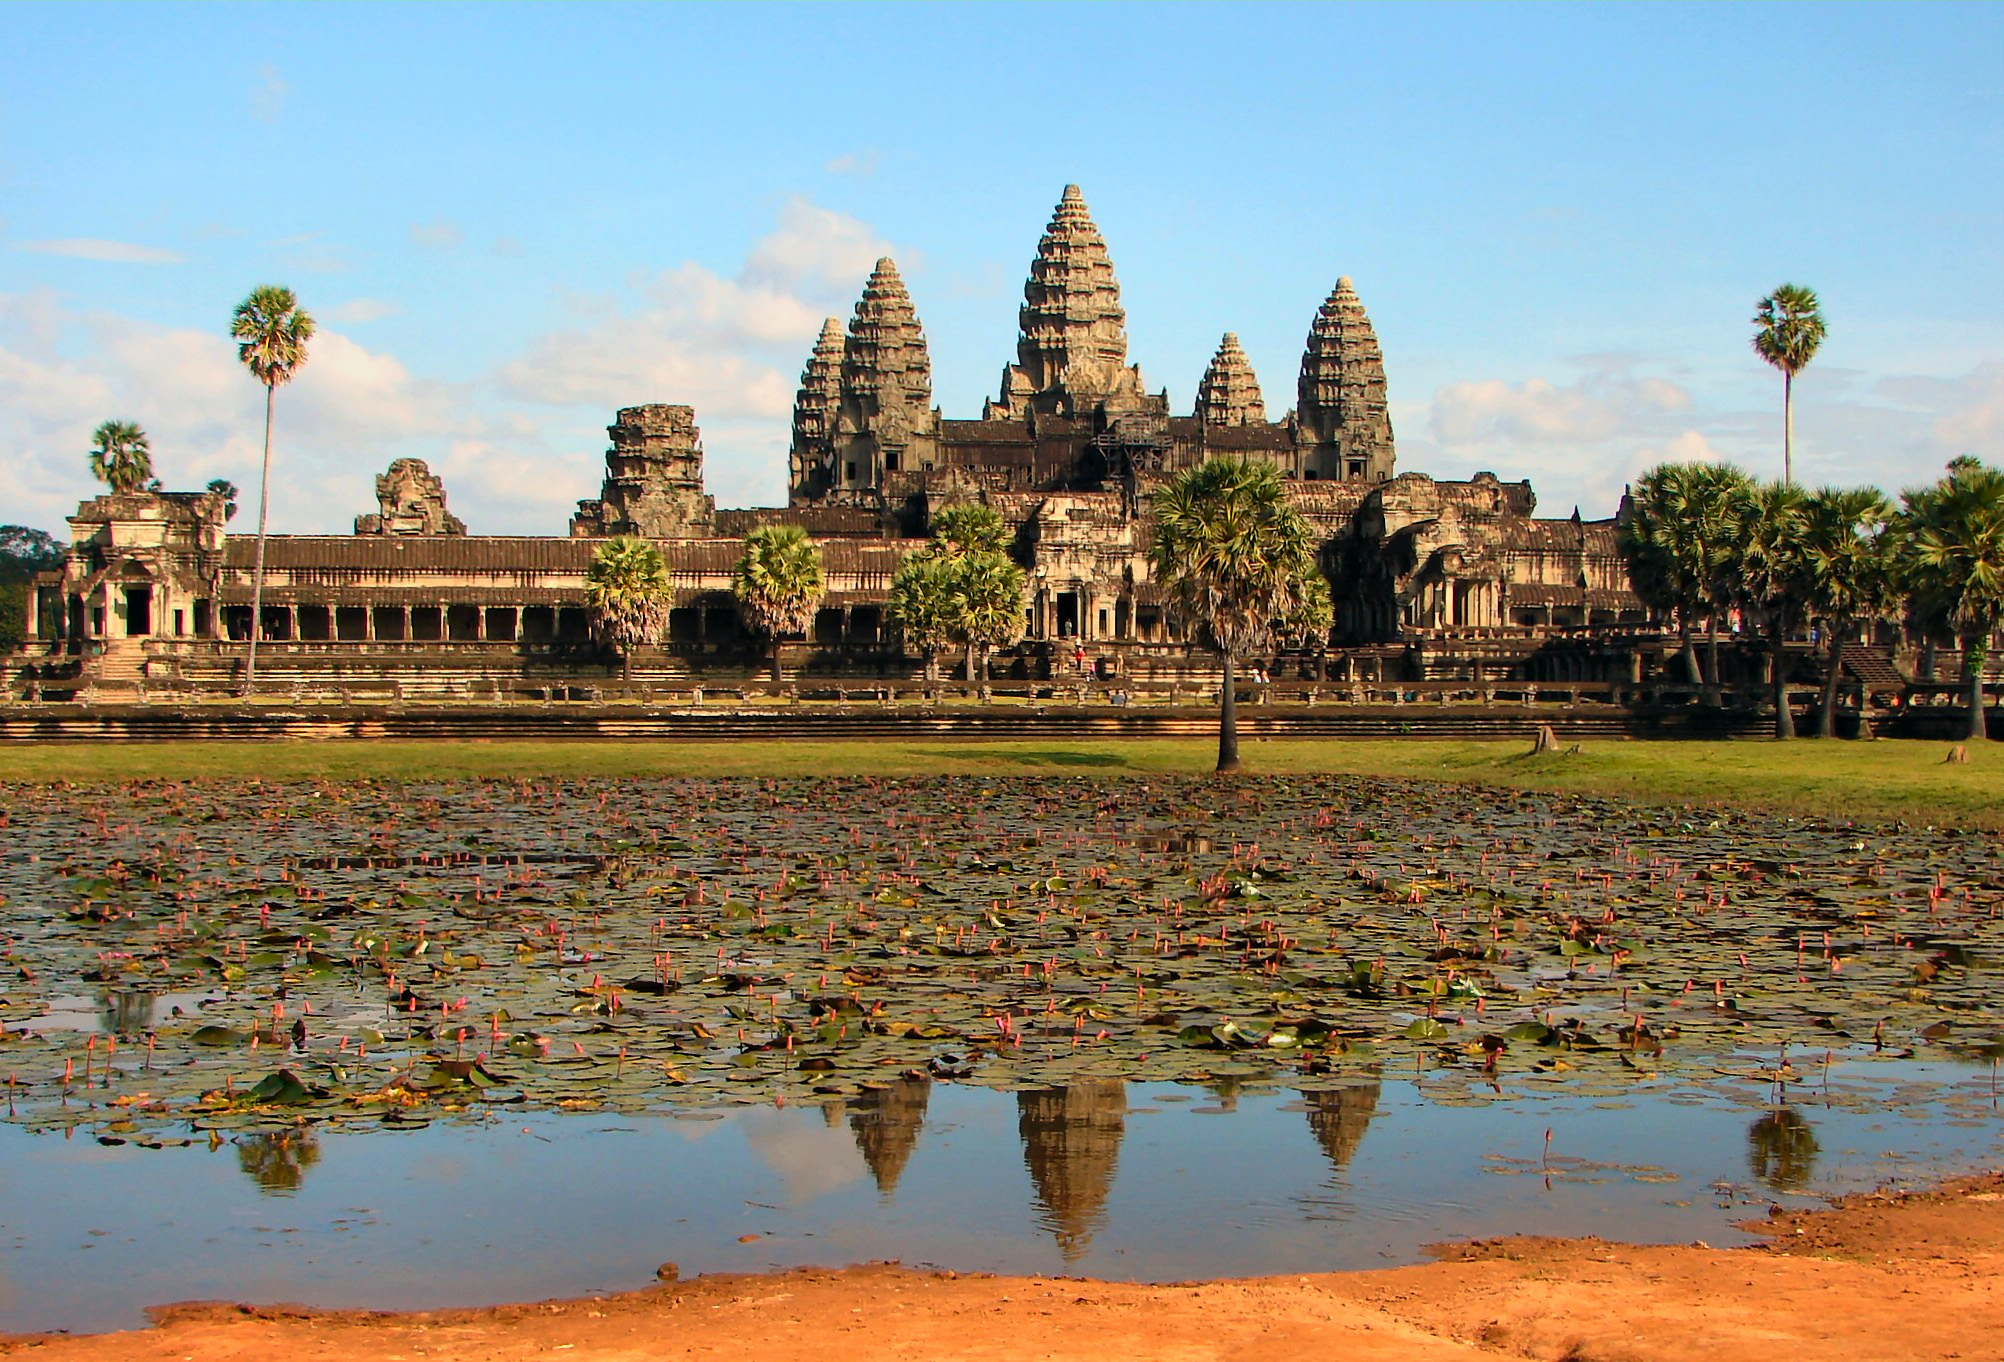 The impressive landscape of Ankor Wat